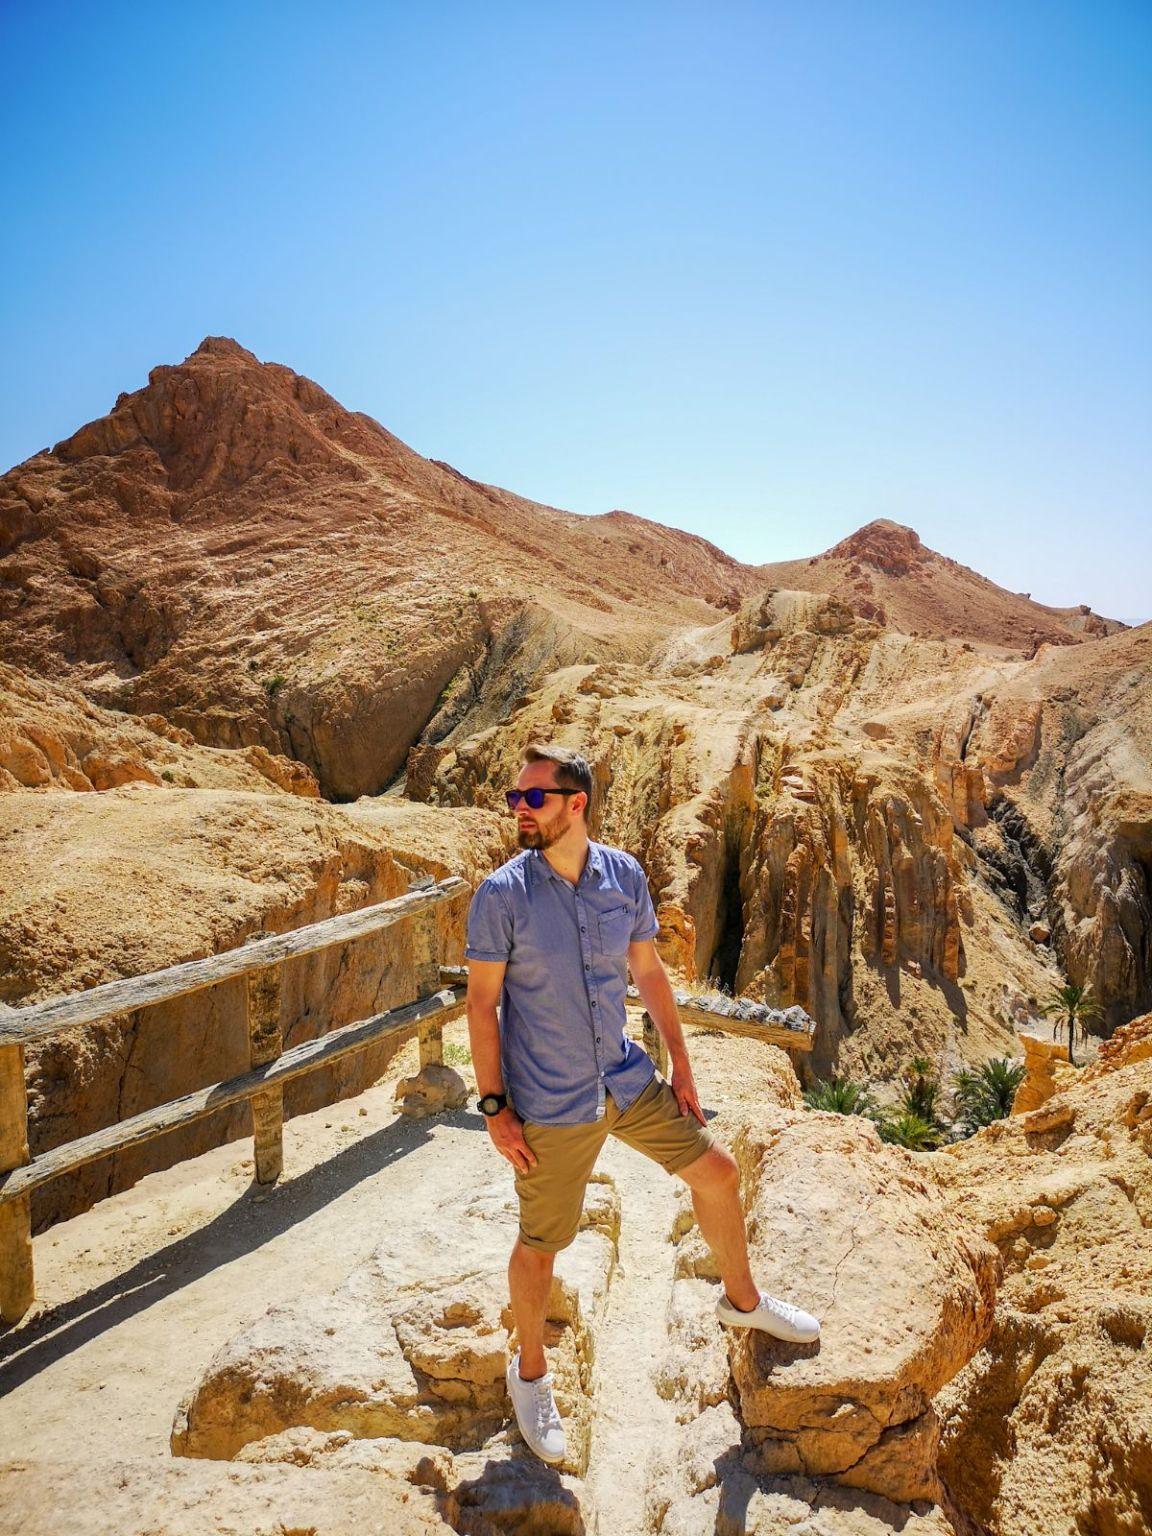 Oaza chebika szebika pustynia tunezja